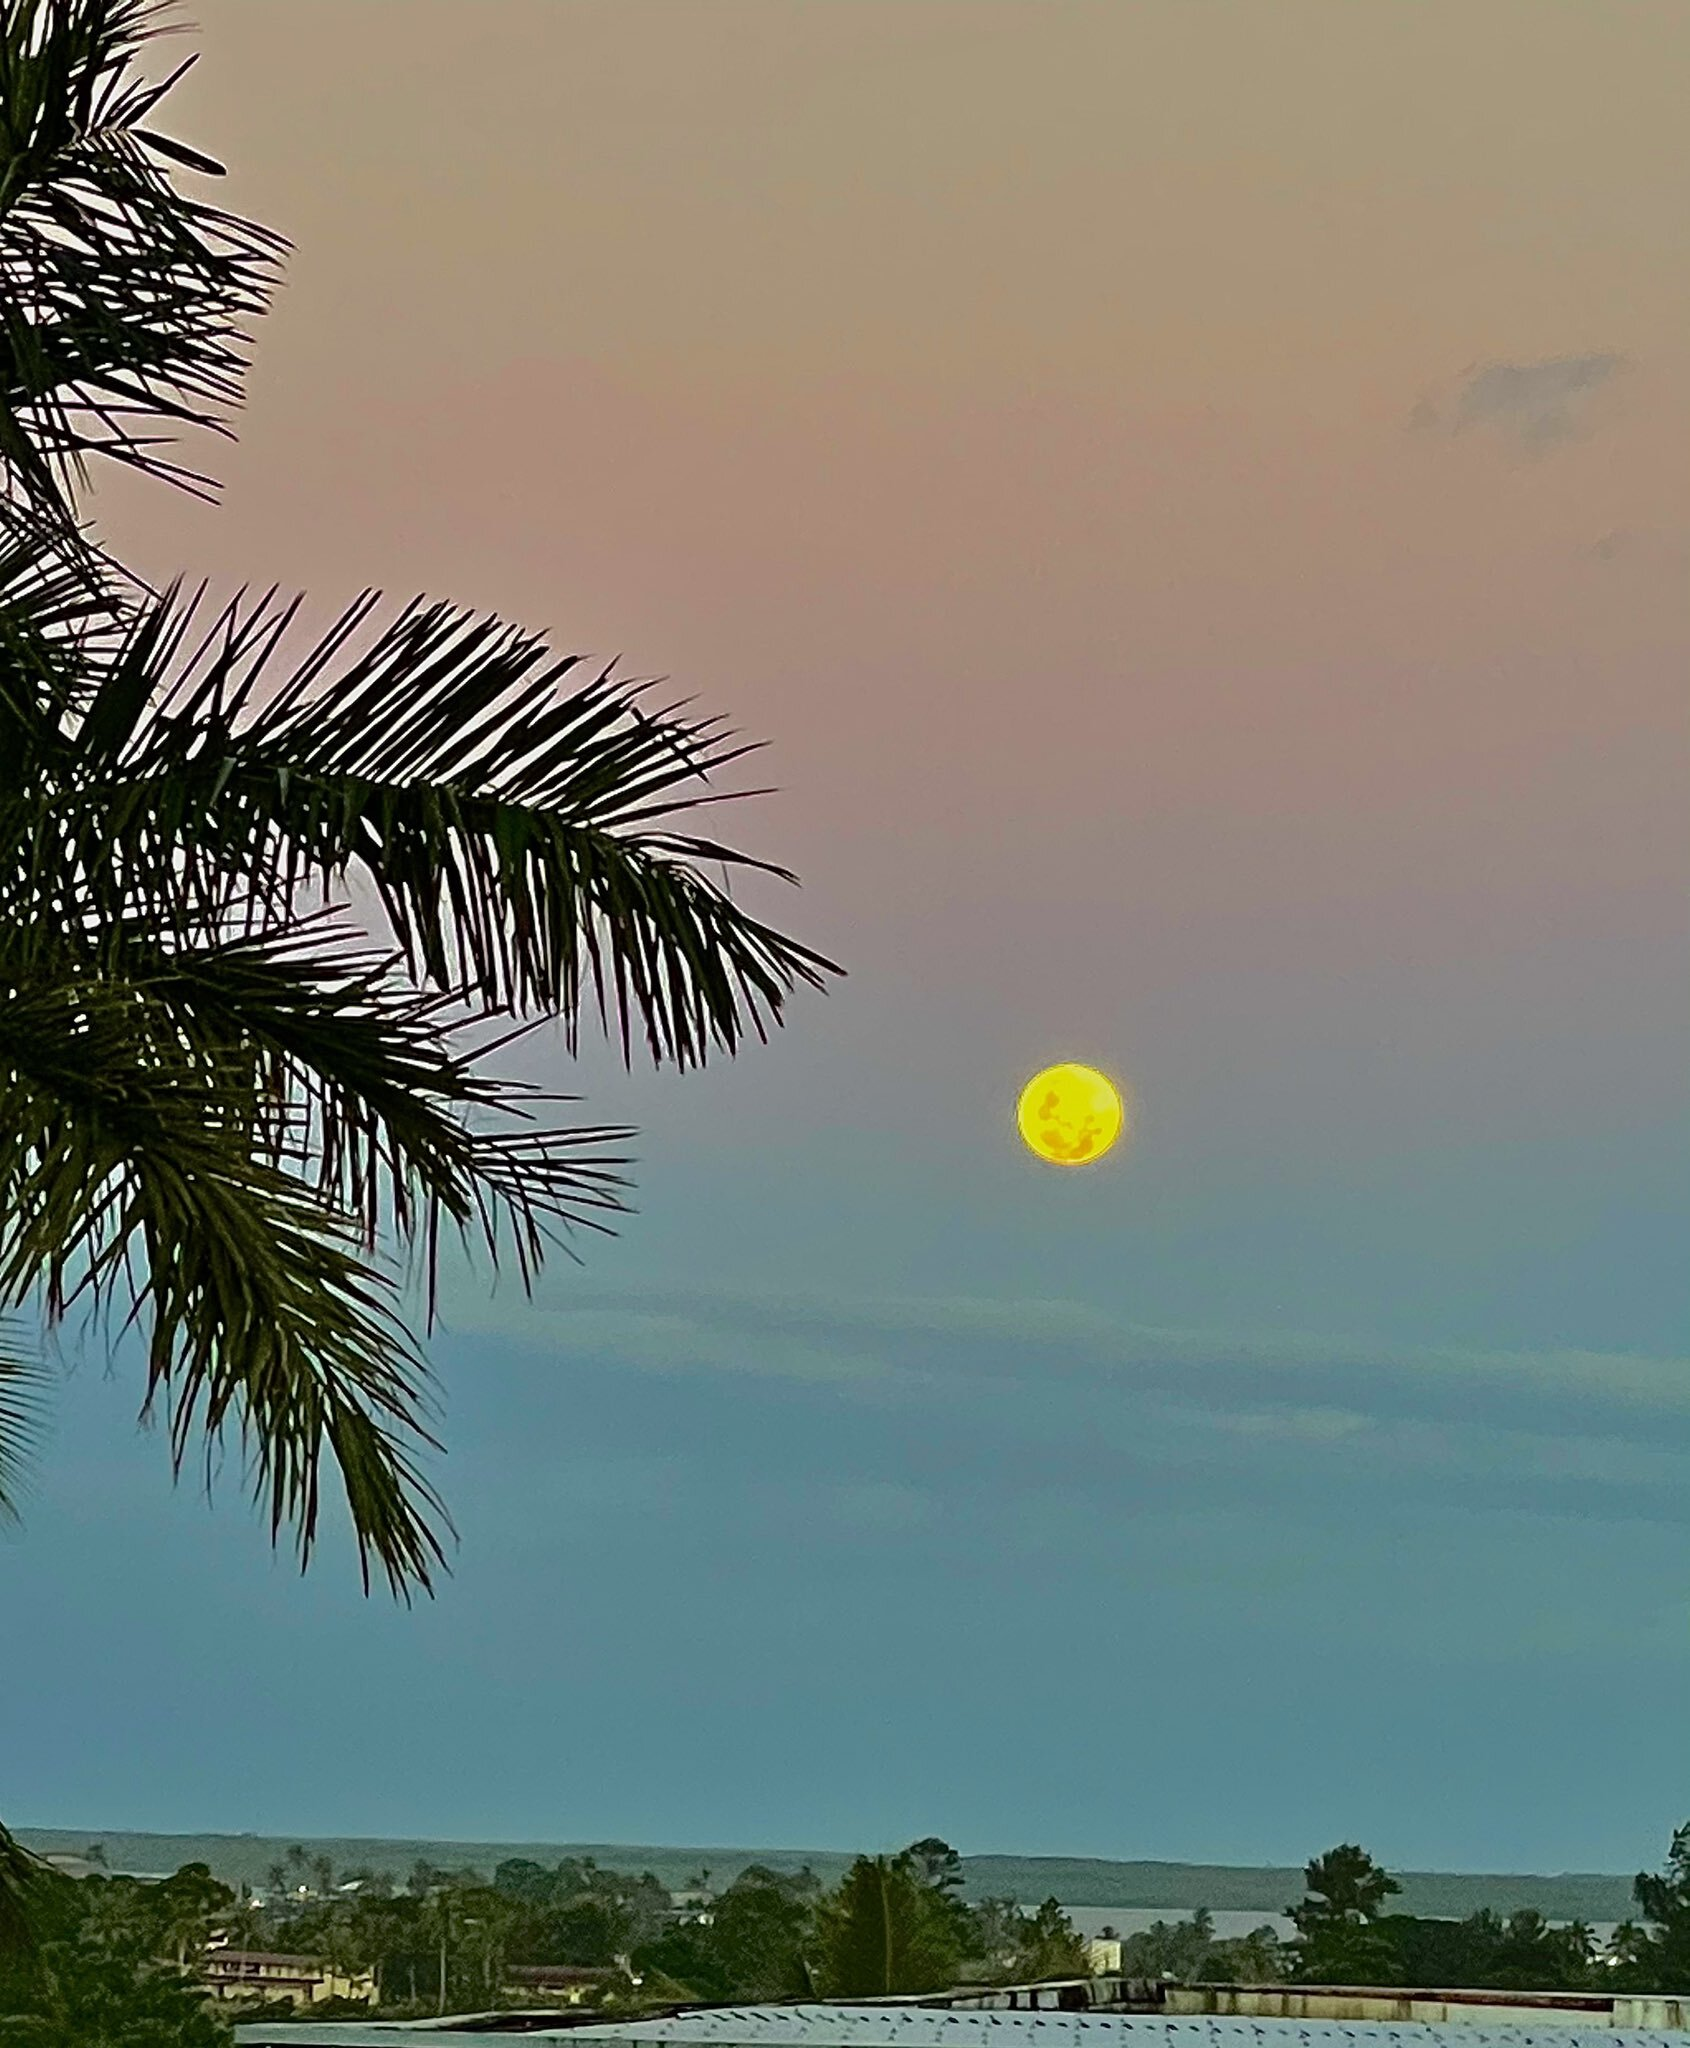 Lunar Eclipse 2021: Full Moon